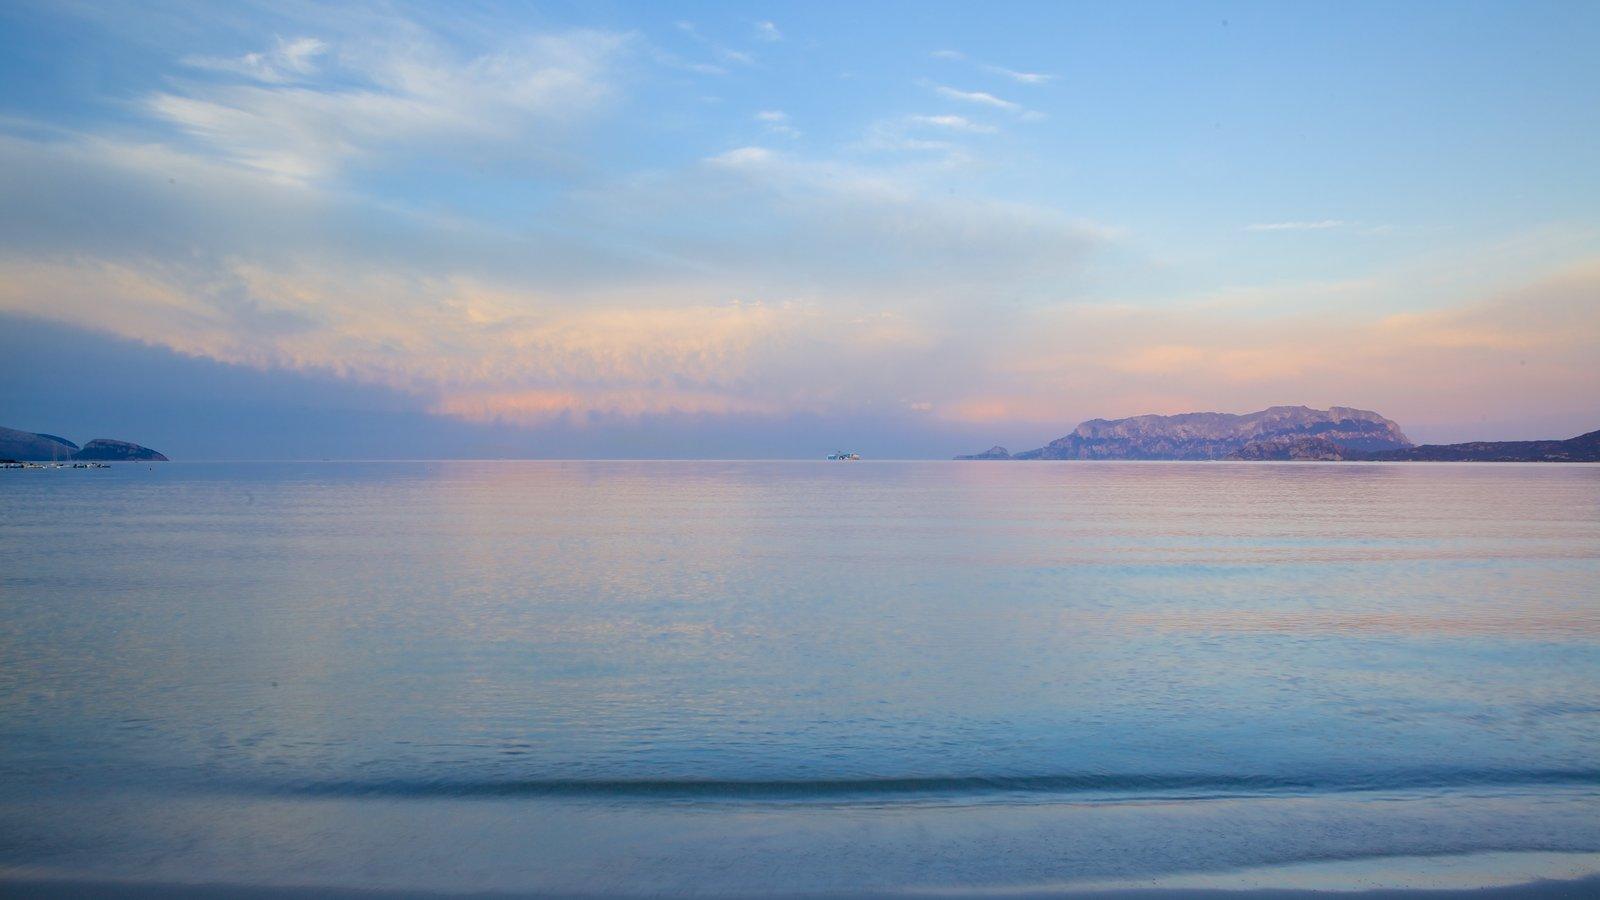 Pittulongu Beach which includes a beach and a sunset